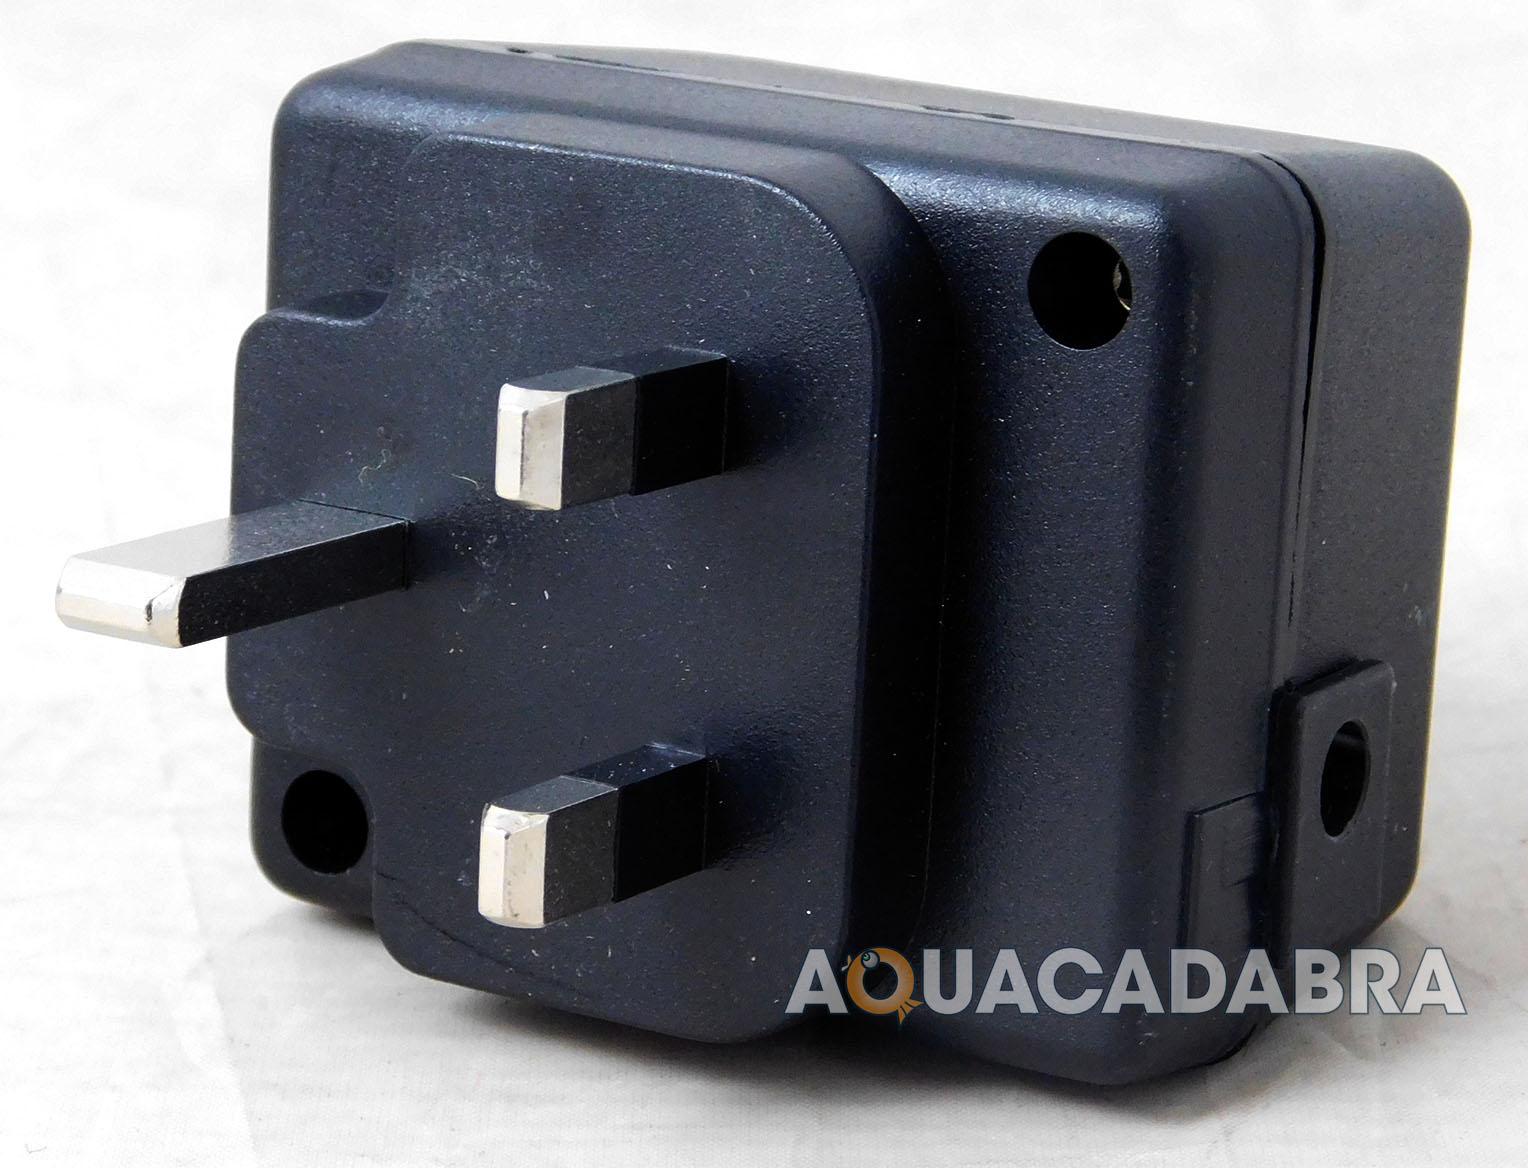 Replacement Pump Lights : Marina filter pump light unit replacement